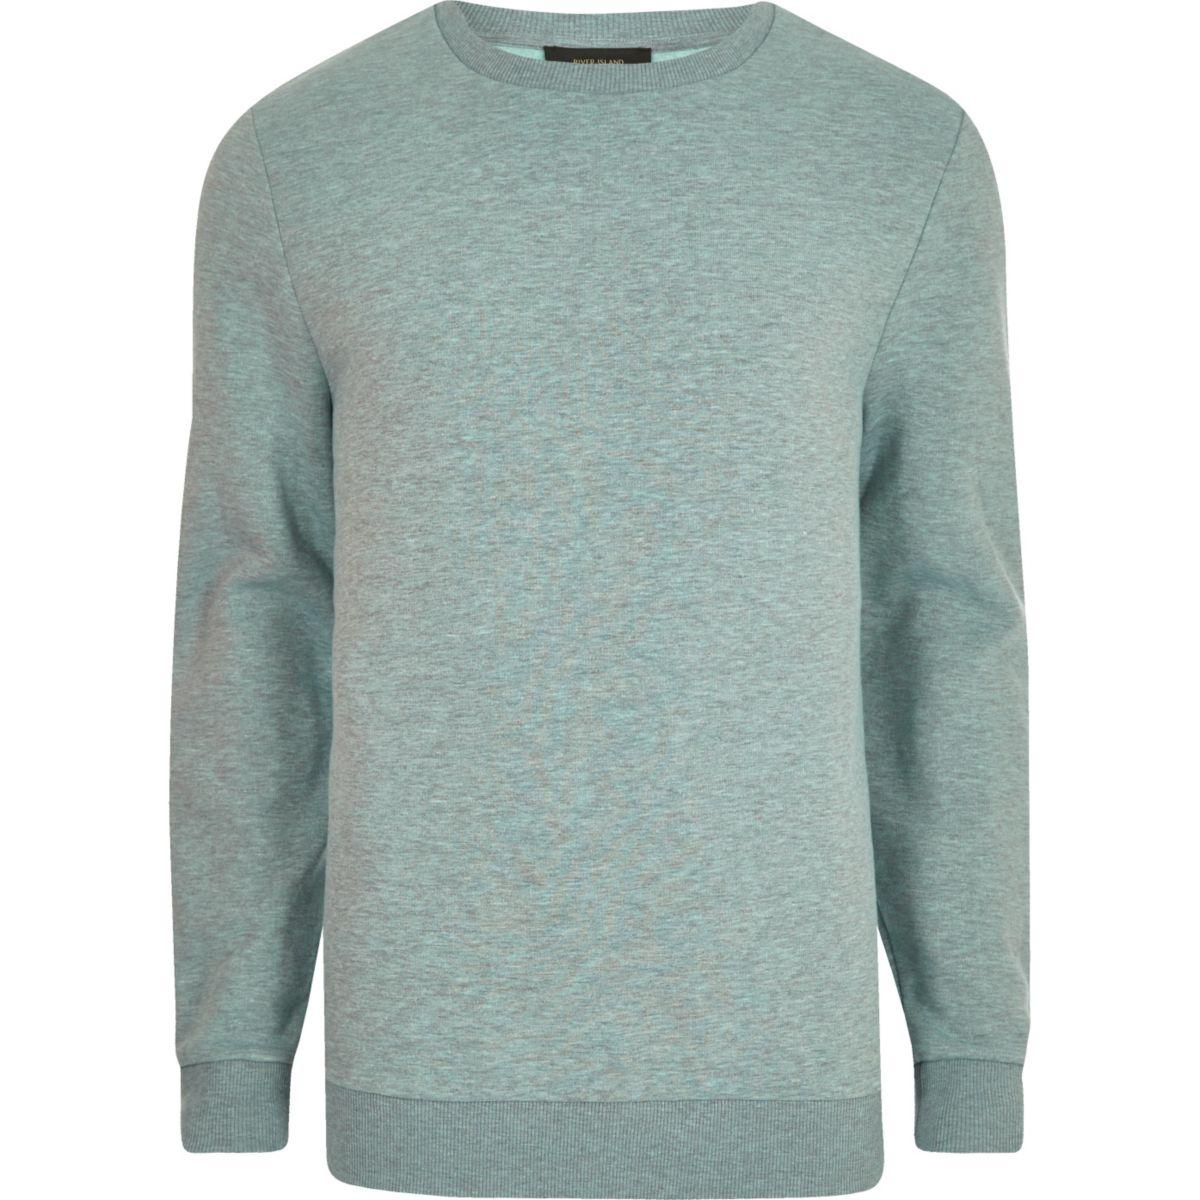 Light green marl crew neck sweatshirt